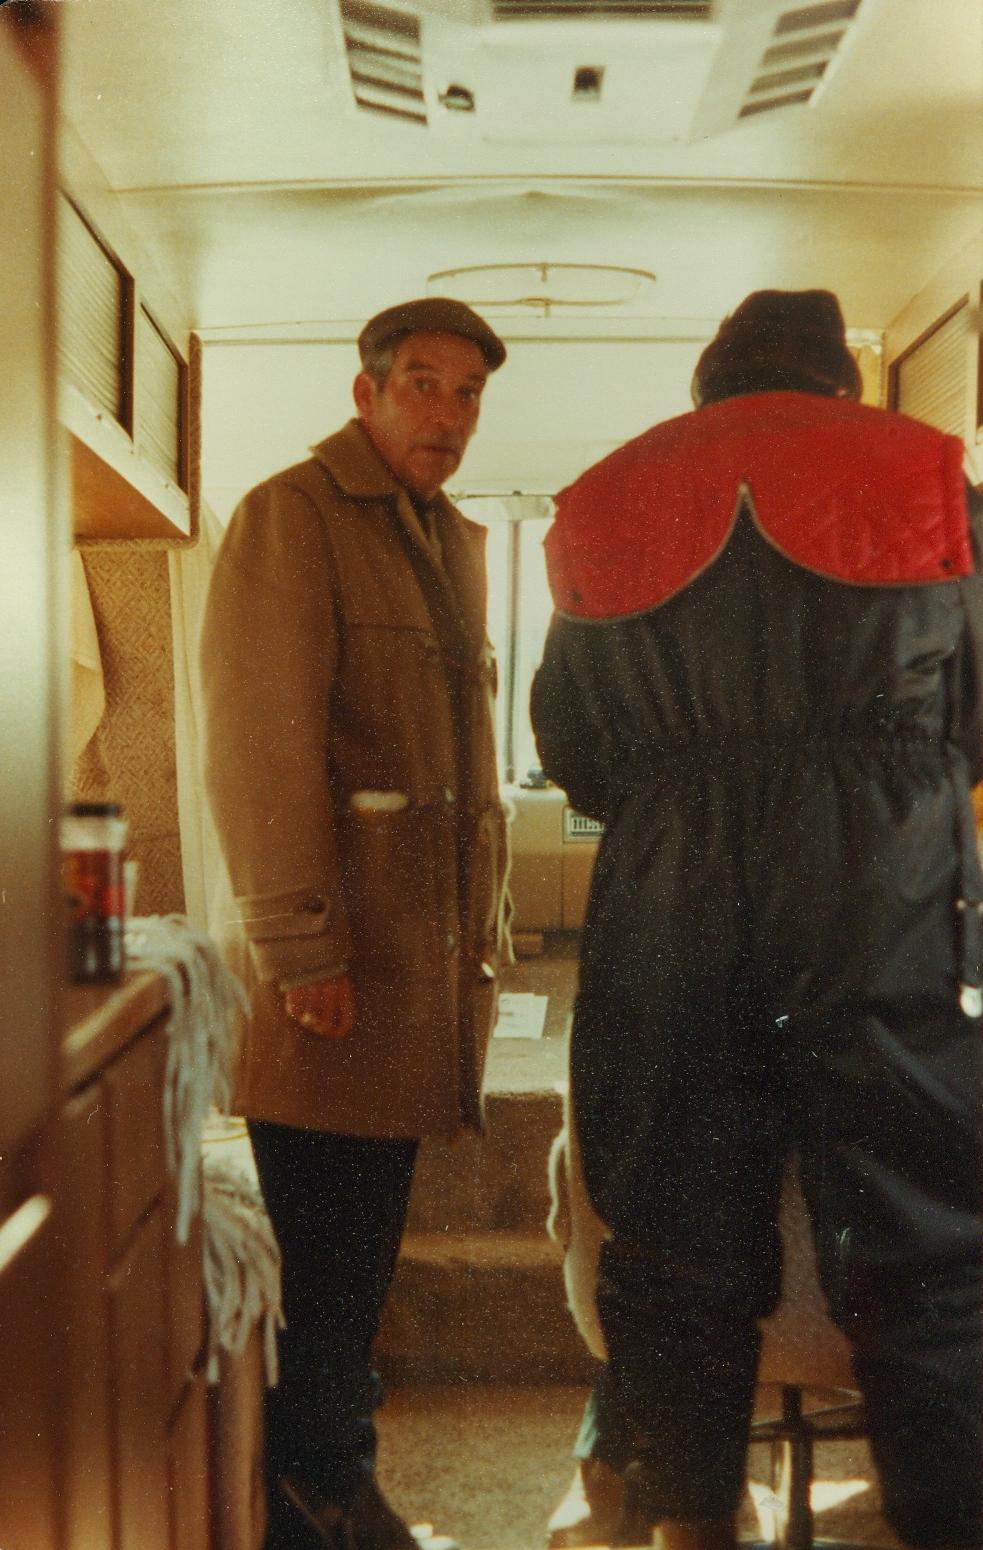 Snofest 1984 possibly - Grant Airhart.jpg